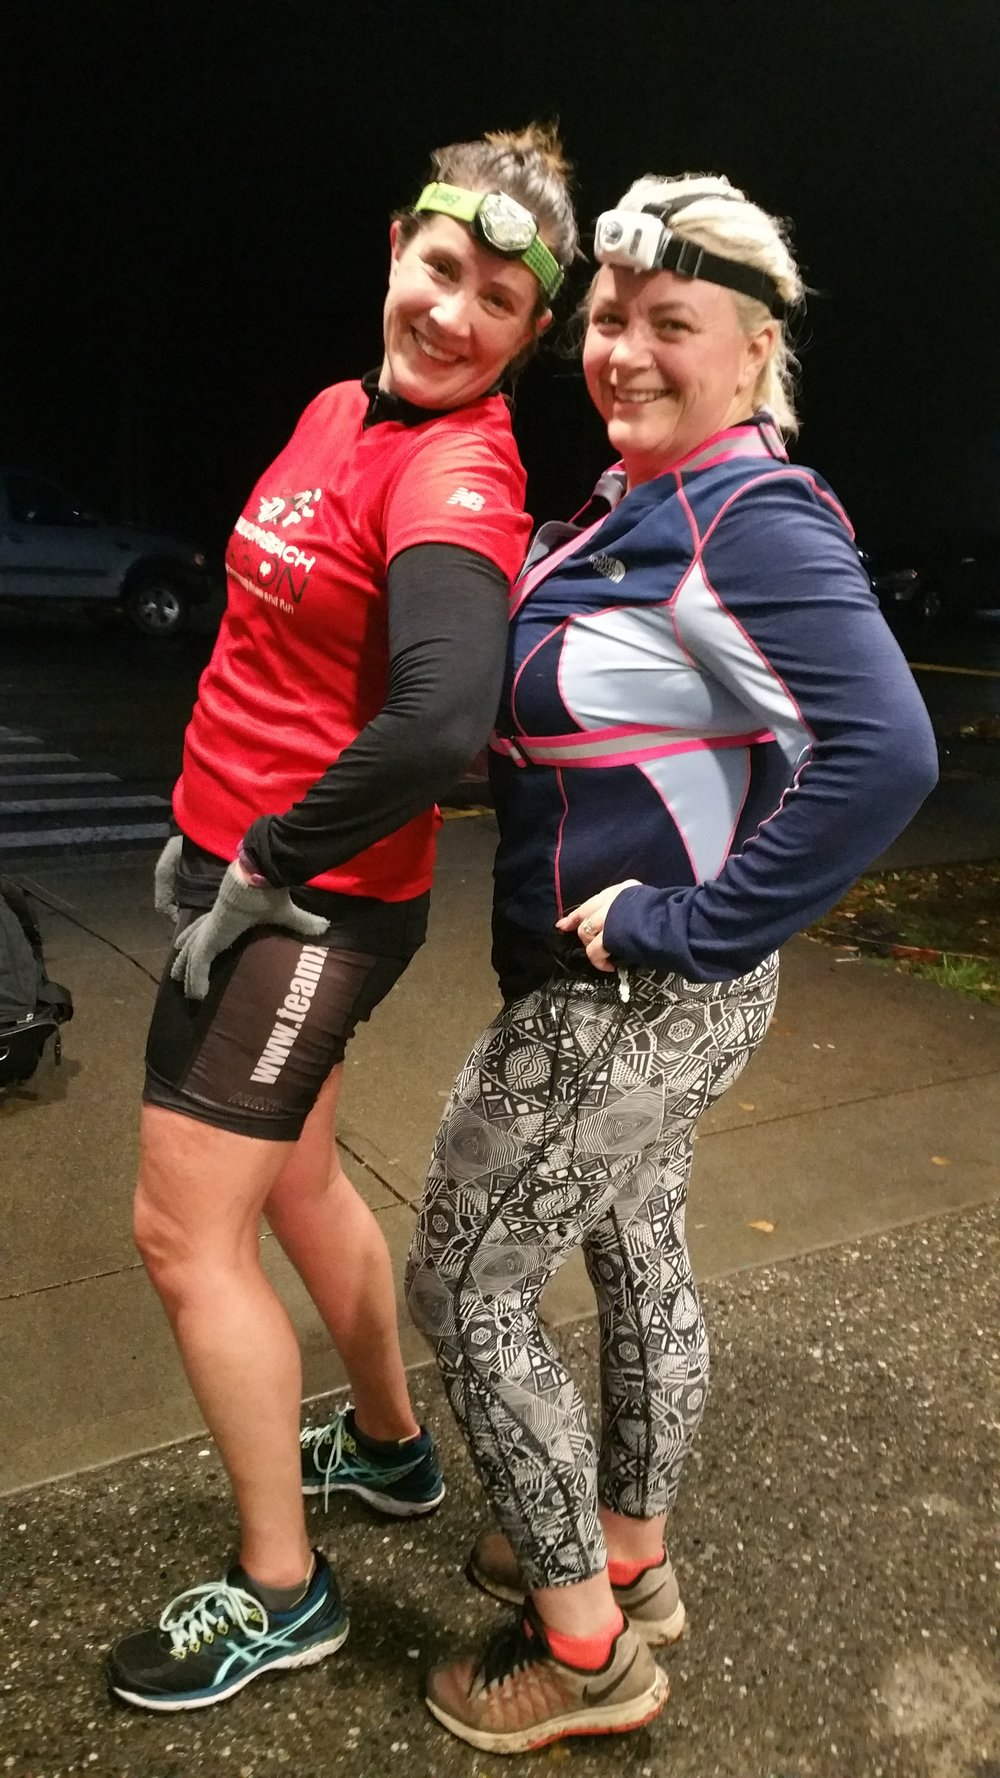 Teresa and Megen ready for a night run!